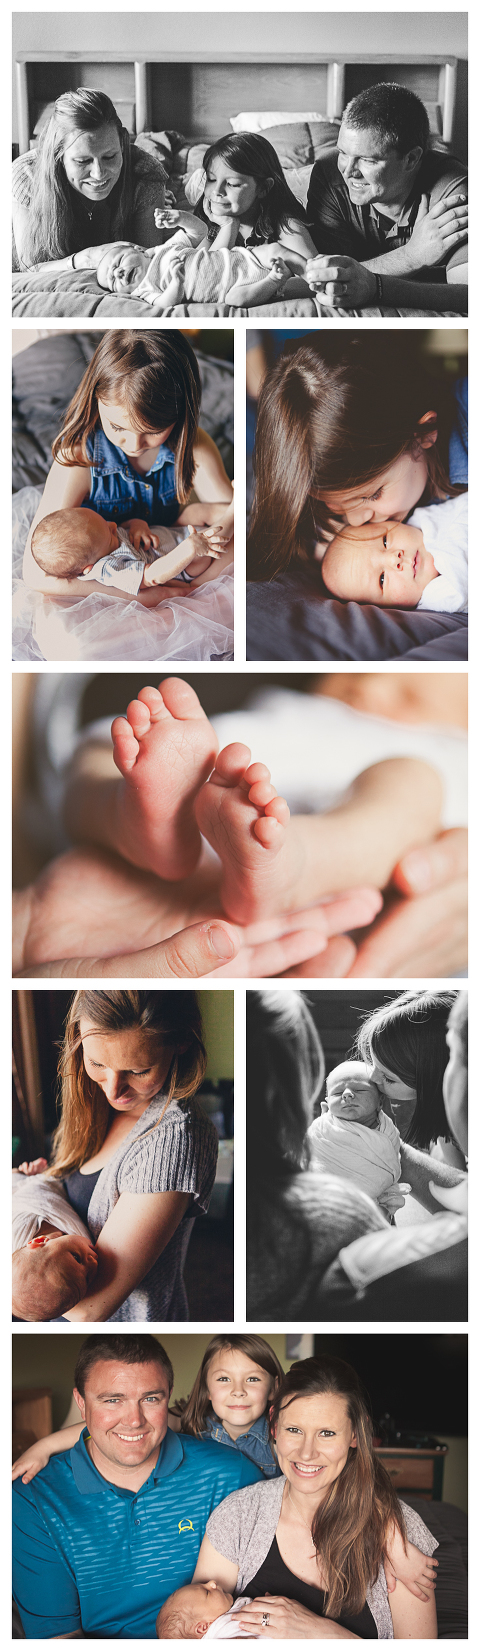 Baby Curtis-lifestyle newborn photography by Hailey Haberman in Ellensburg WA